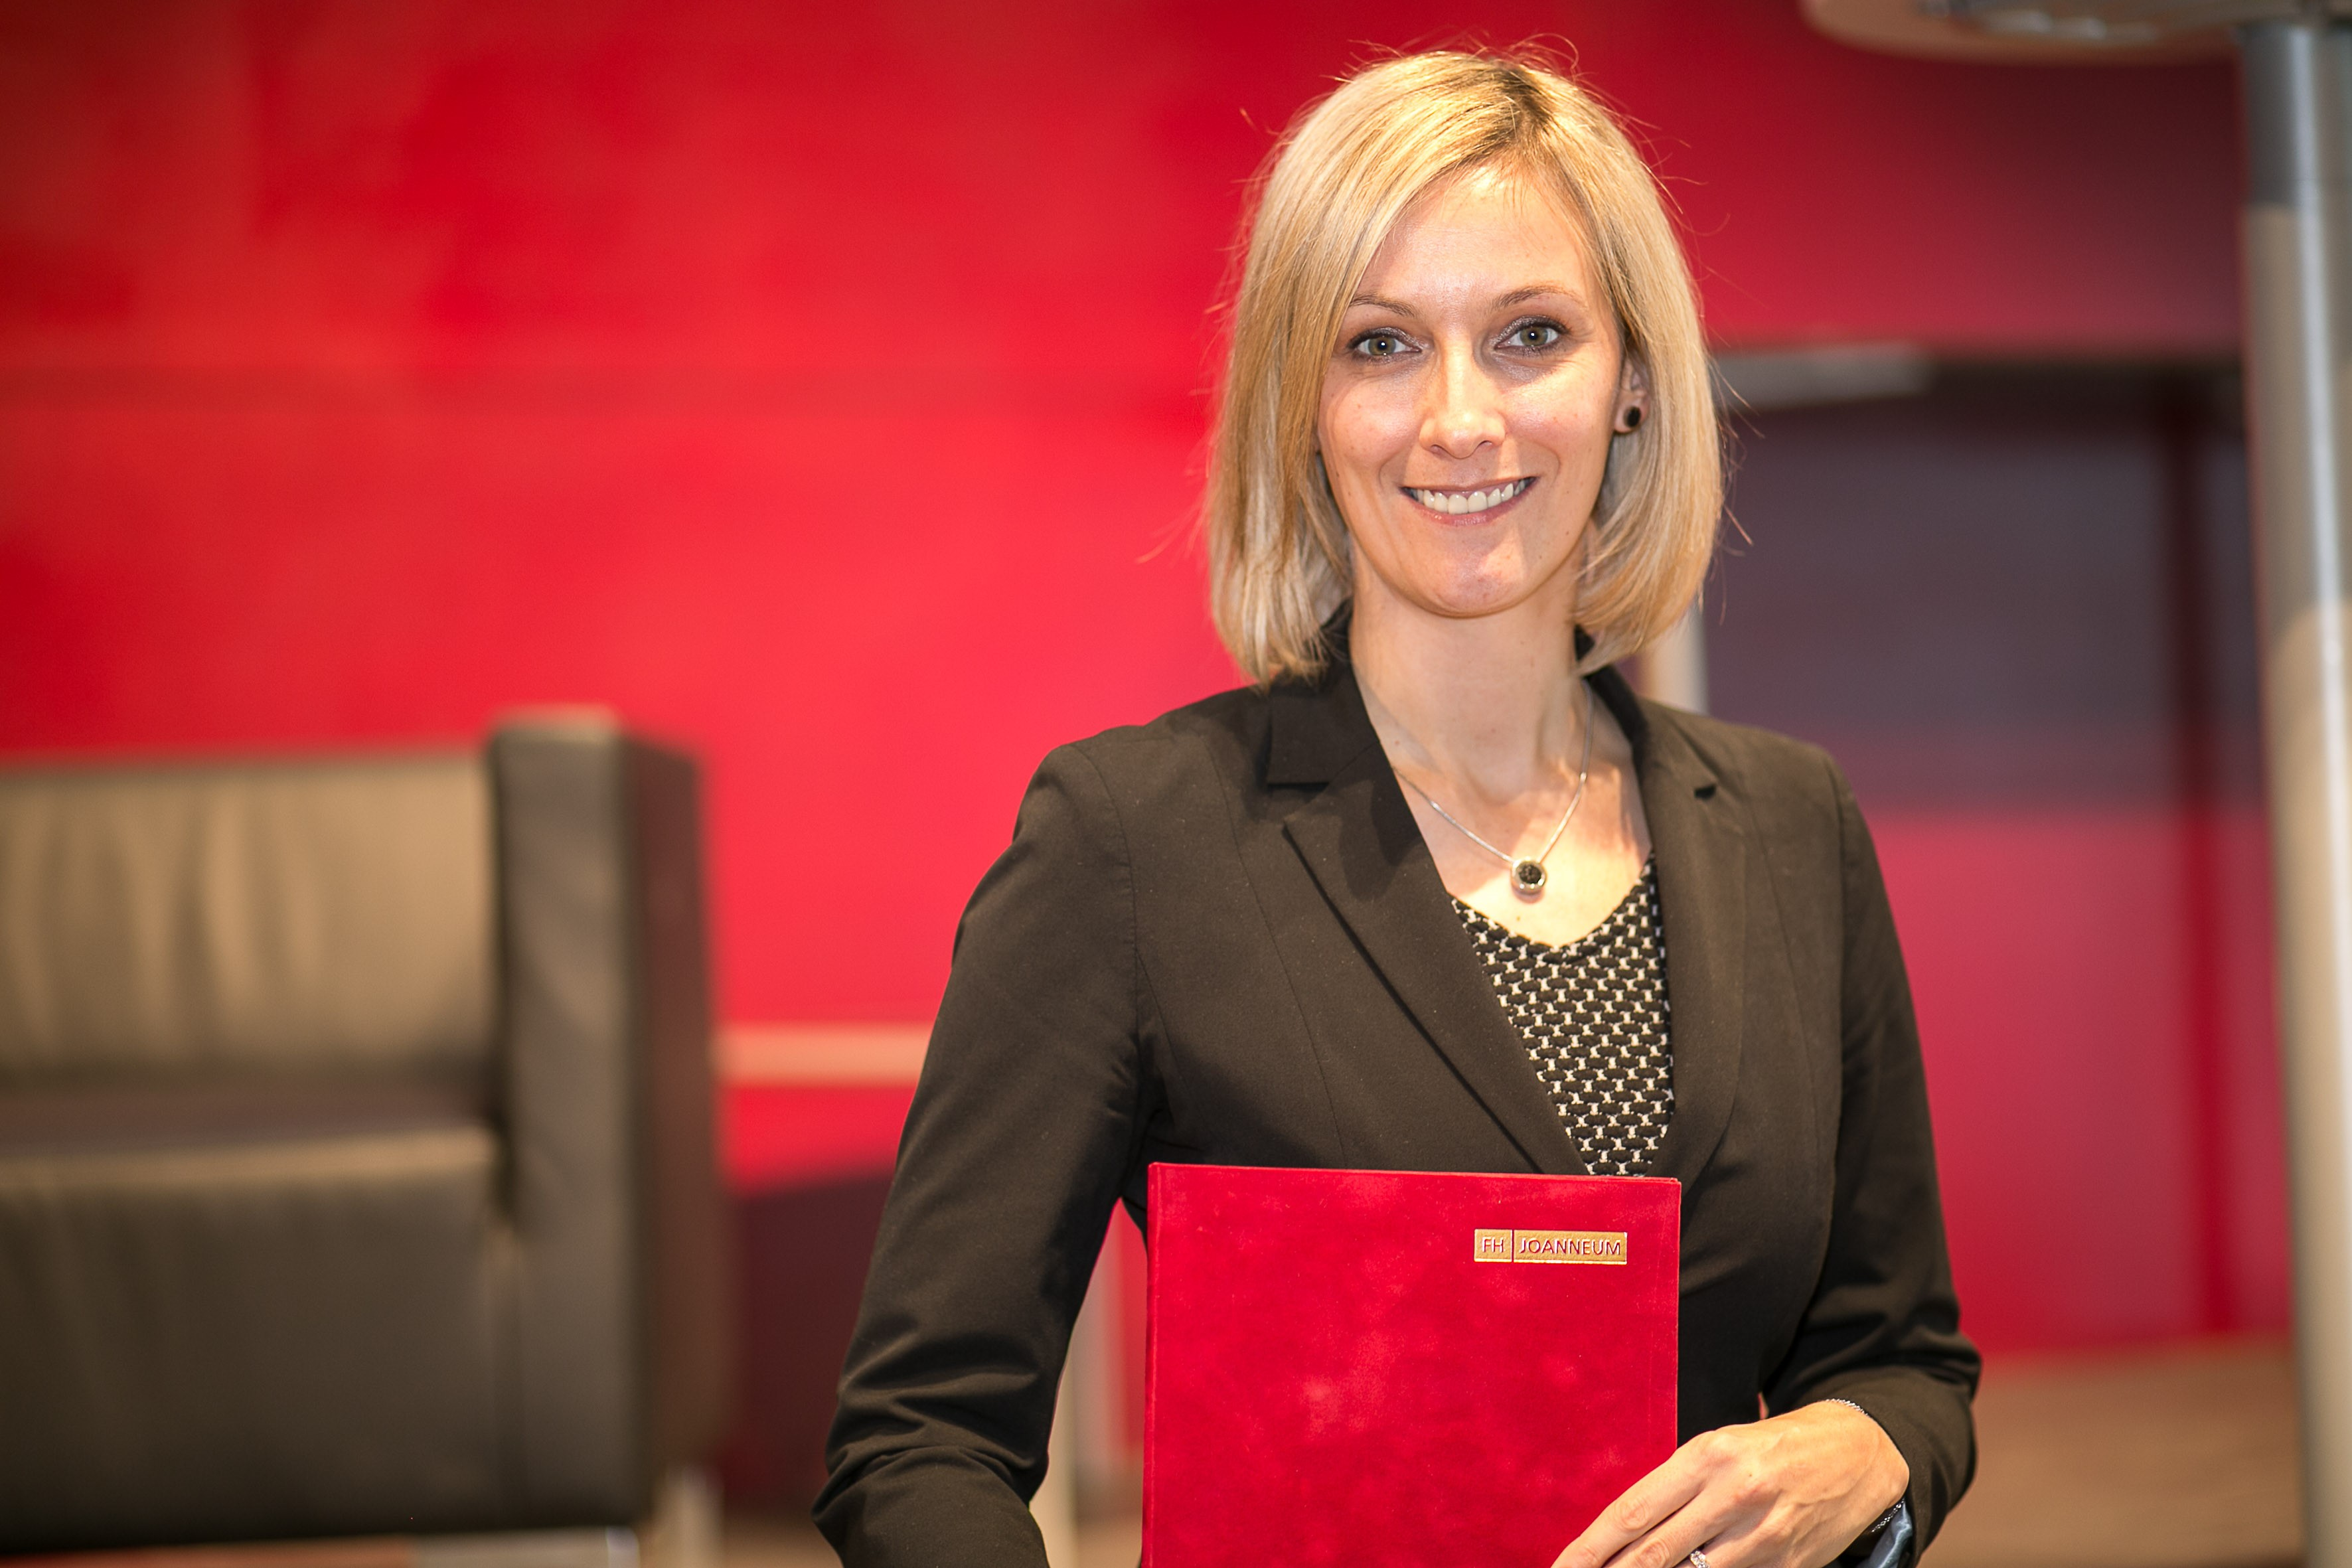 Magdalena Brunnhofer hat den Teaching Award 2018 bekommen.